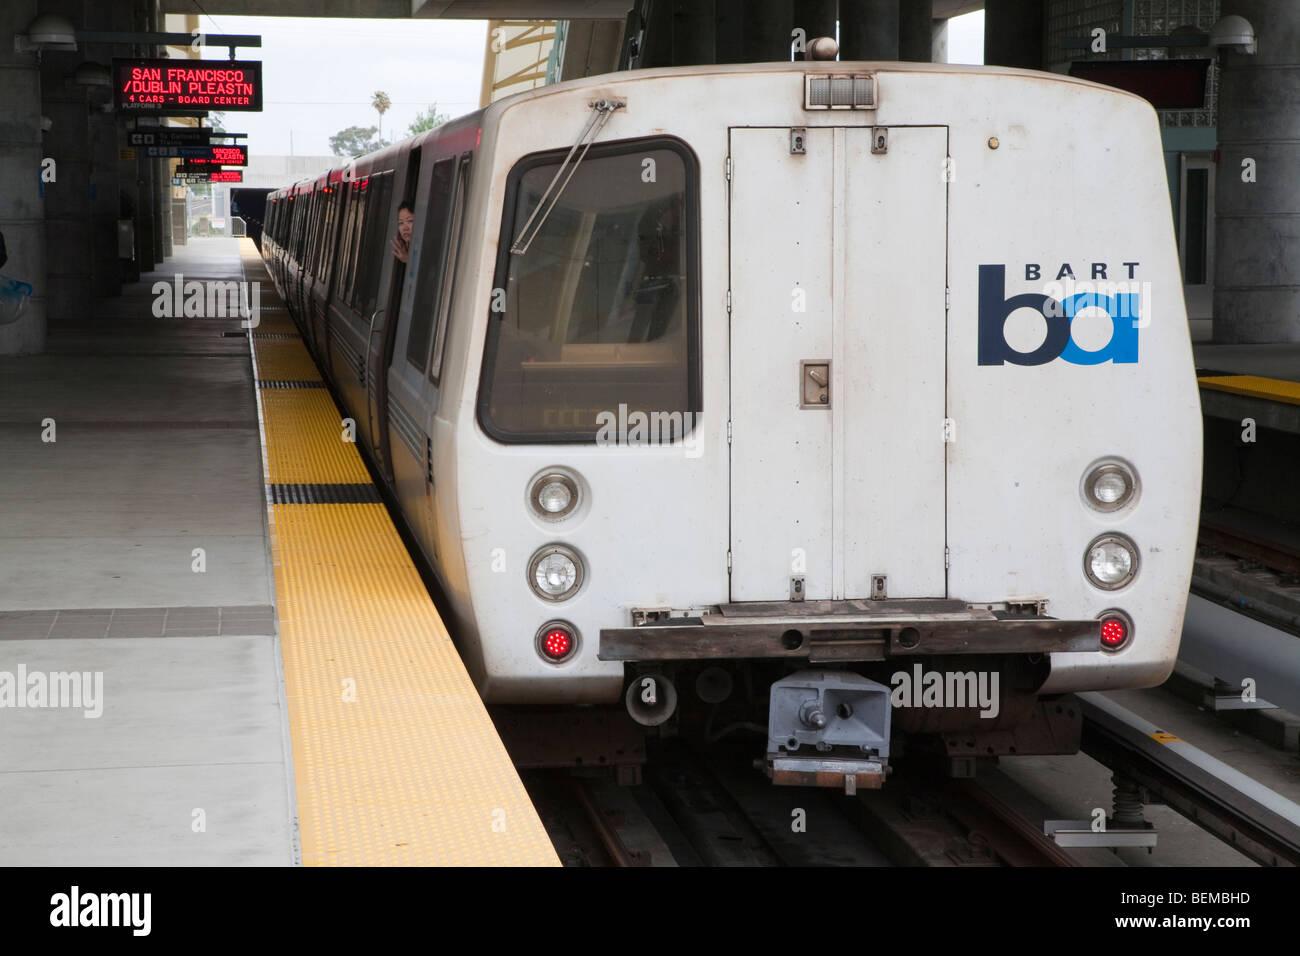 A BART heavy rail train arriving at station. Millbrae, California, USA - Stock Image